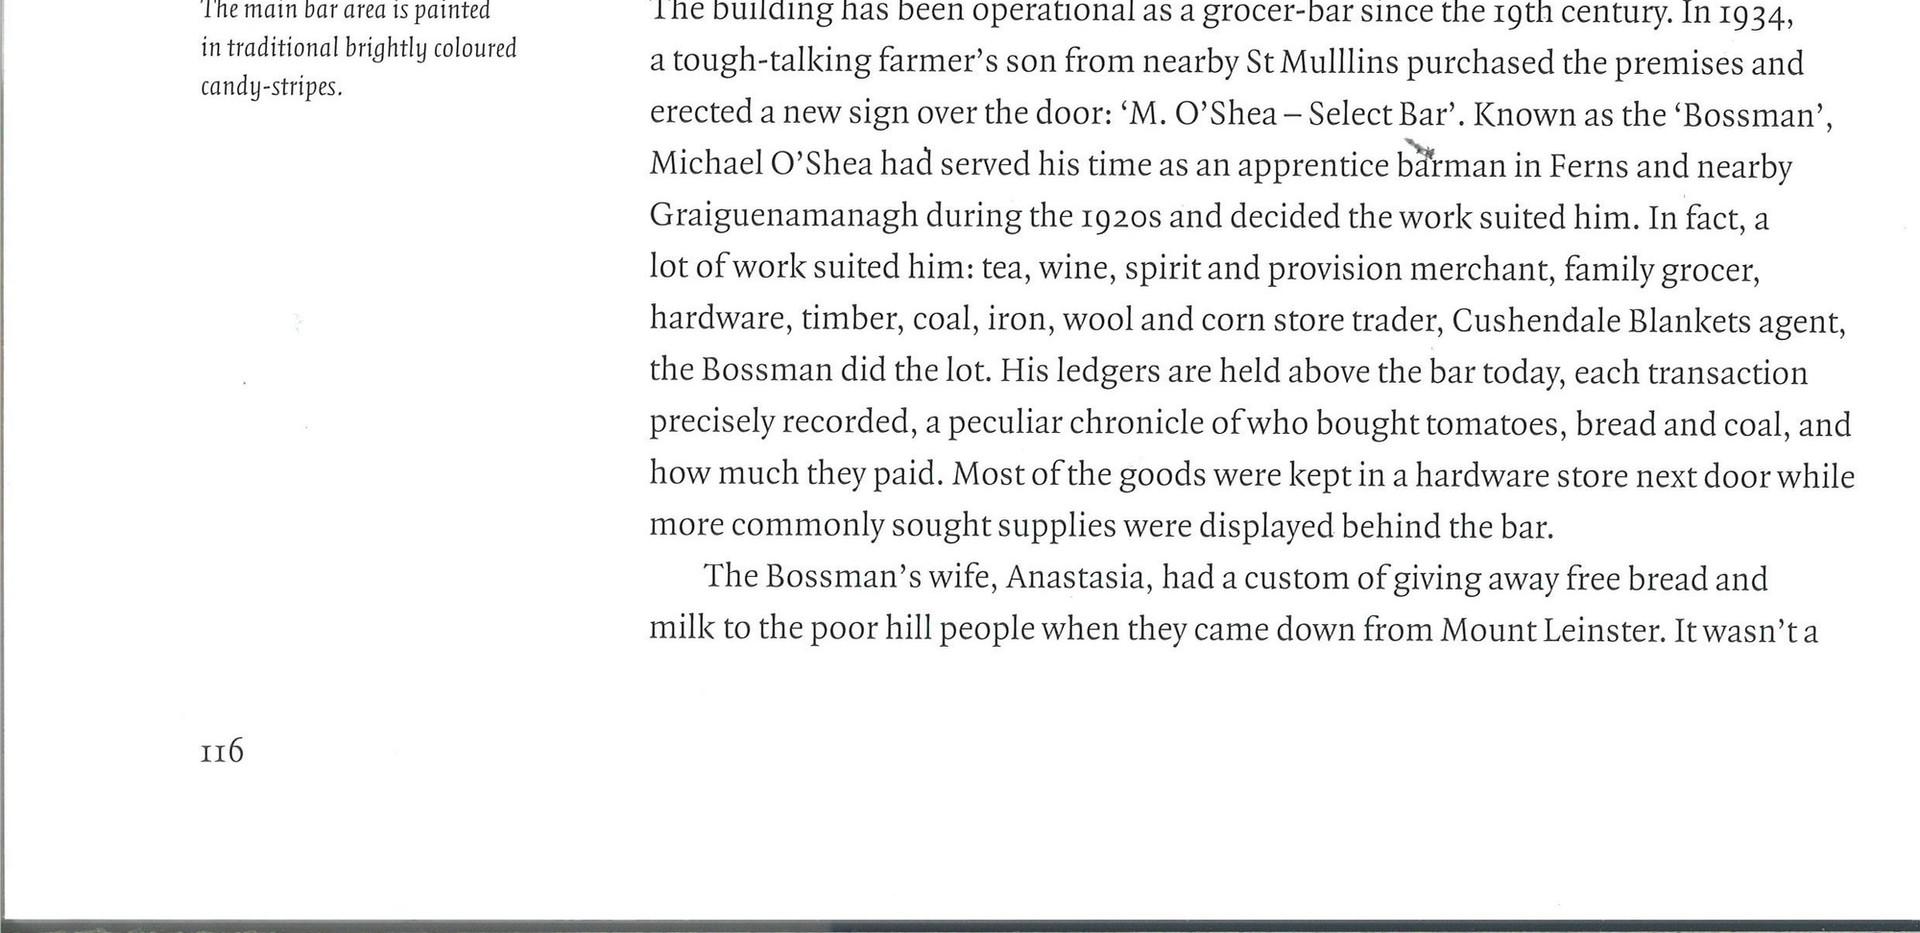 "O'Shea's Bar, Borris, Co. Carlow, fratured in ""The Irish Pub"", Thames & Hudson, James Fennell & Turtle Bunbury"